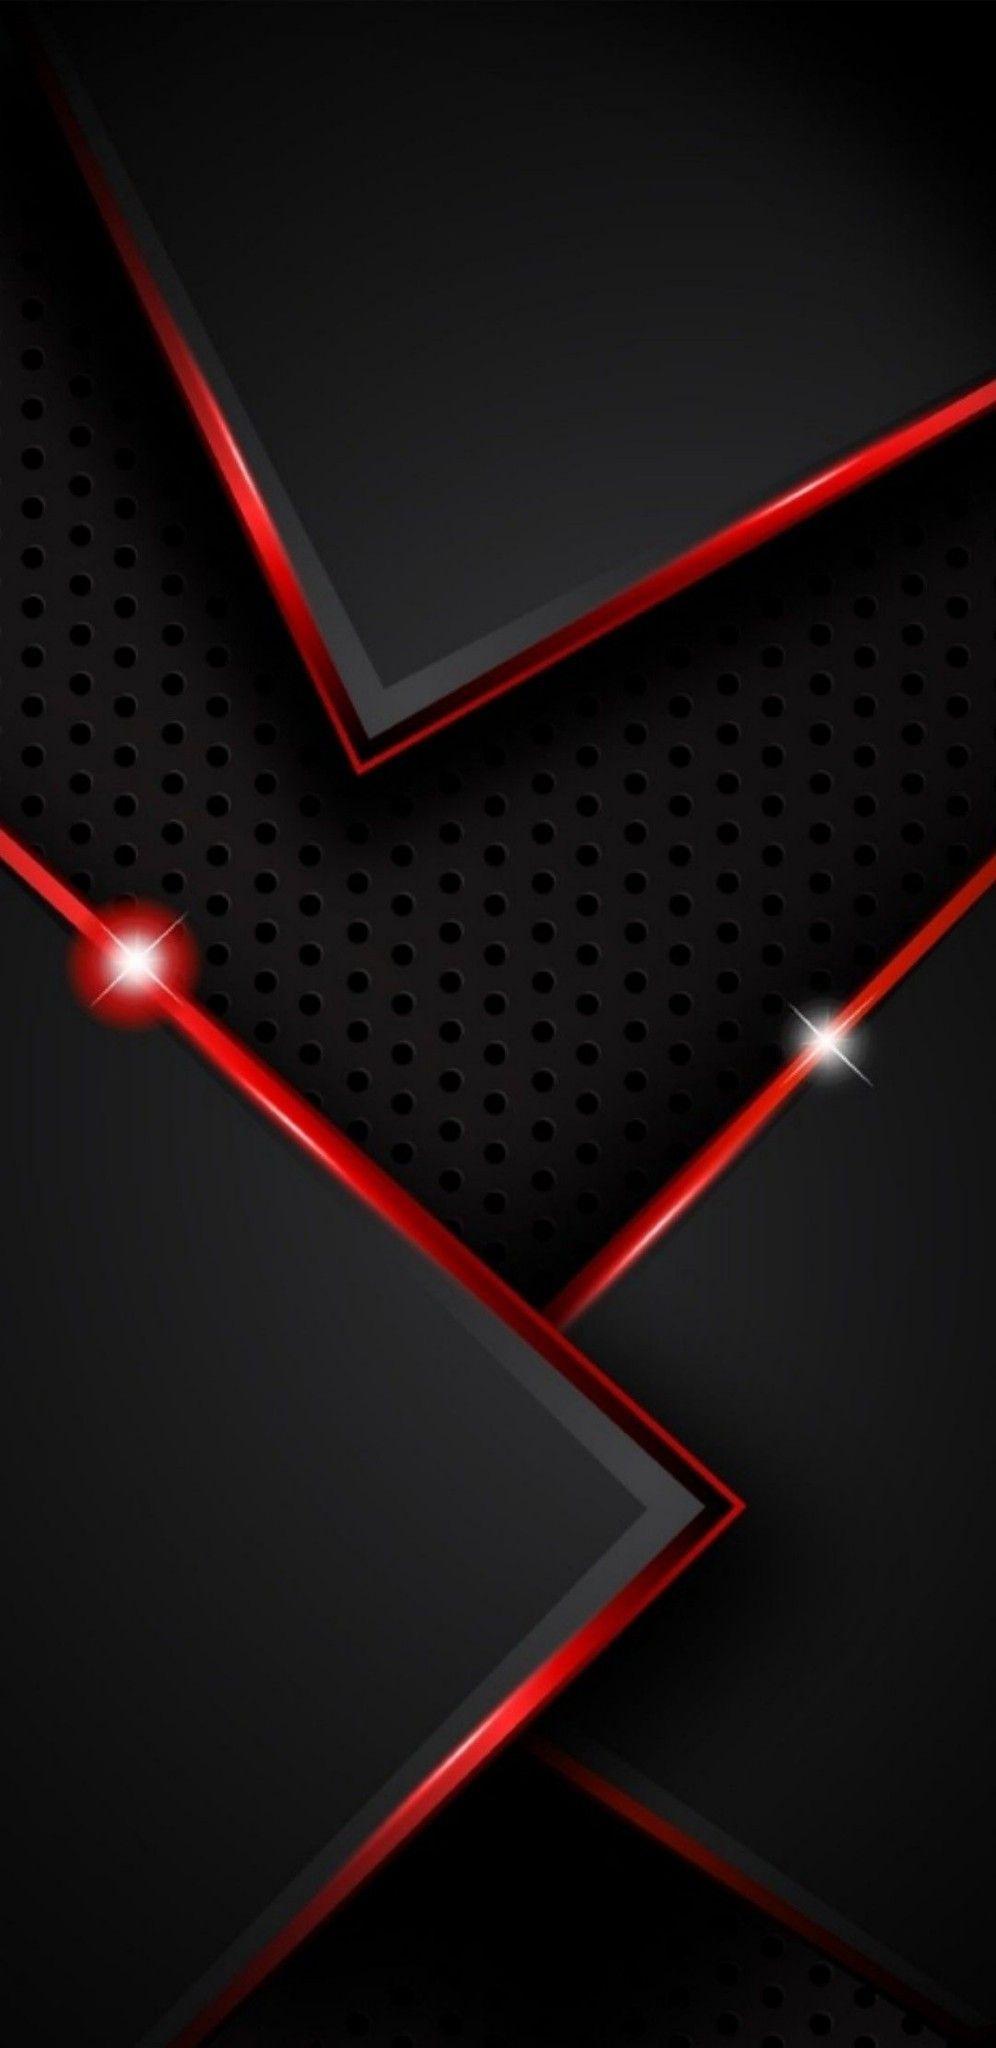 Samsung Wallpaper Red Hintergrundbild Tapete In 2020 Red And Black Wallpaper Red Colour Wallpaper Black Phone Wallpaper